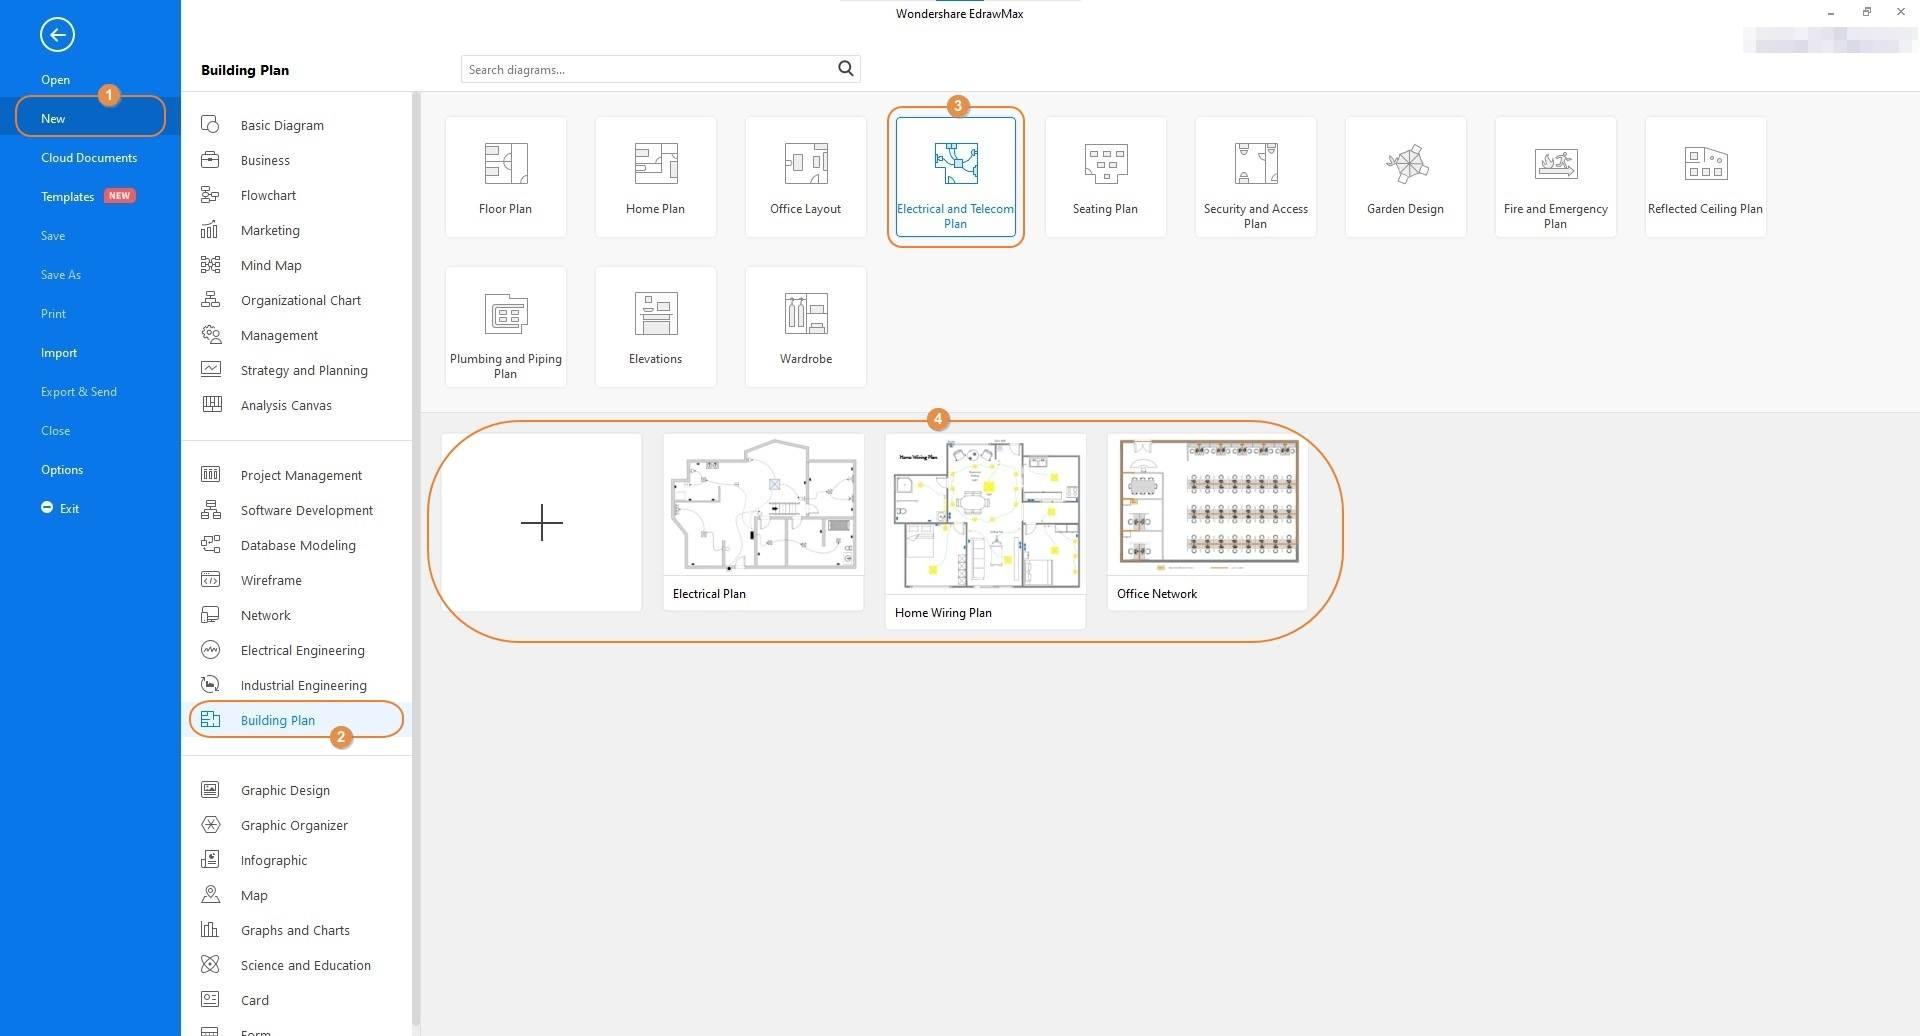 select Building Plan